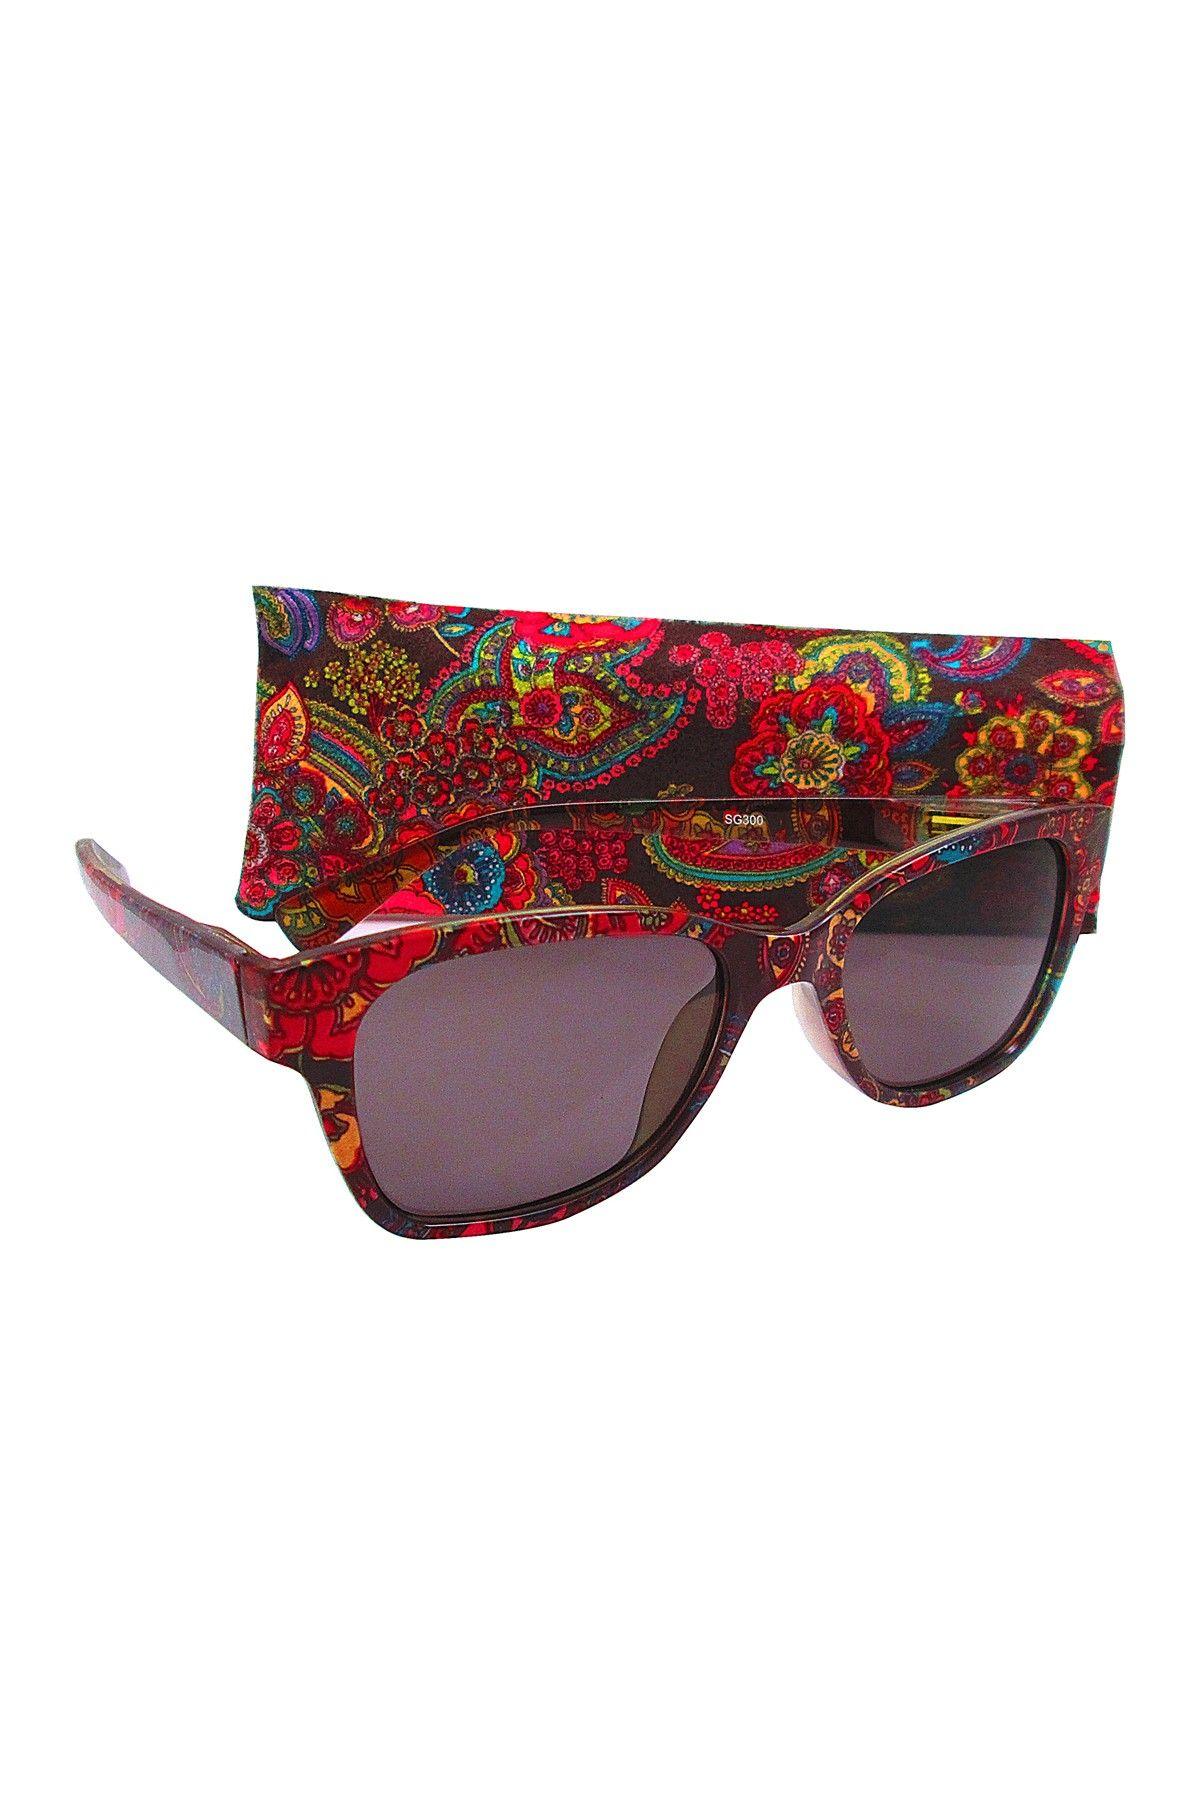 Women's Black Bohemian Sunglasses